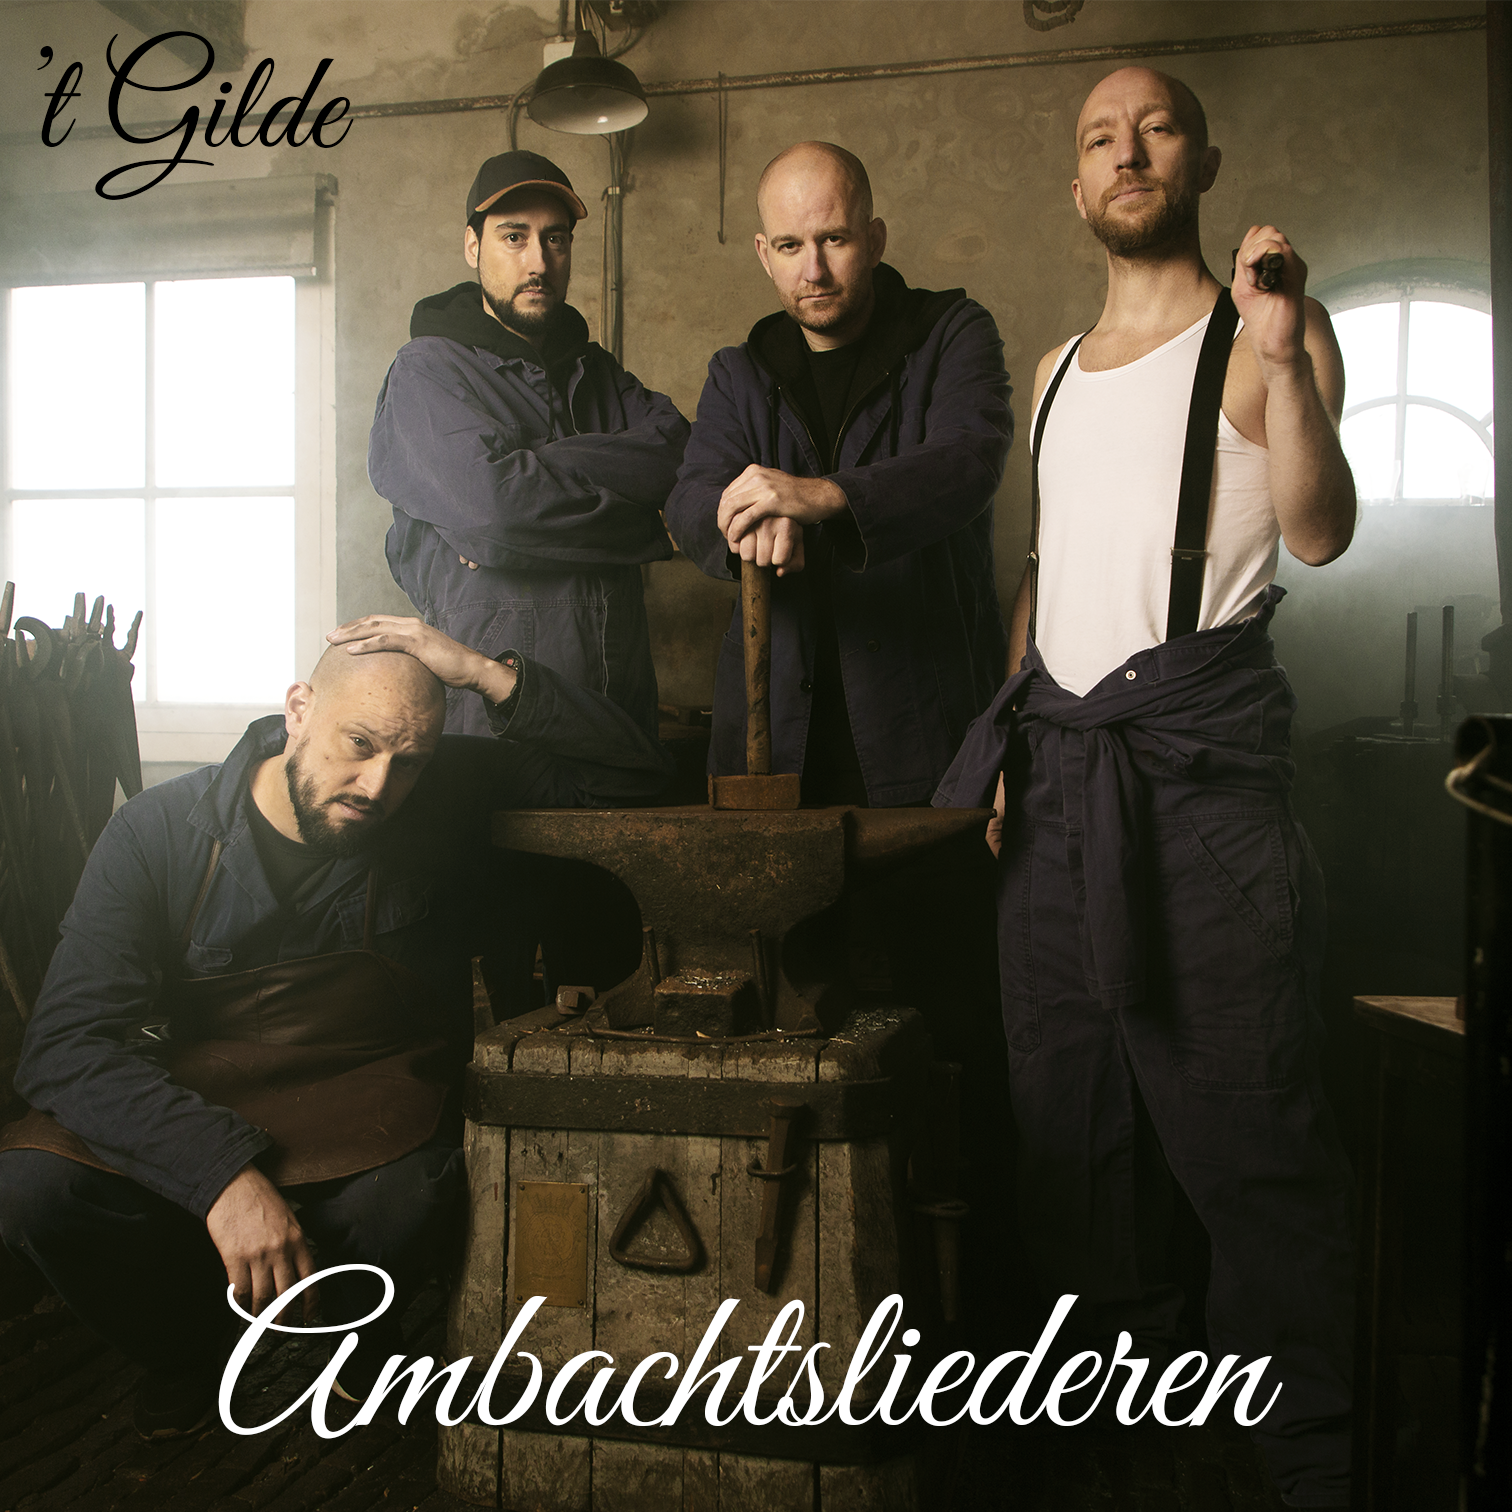 't Gilde - Ambachtsliederen